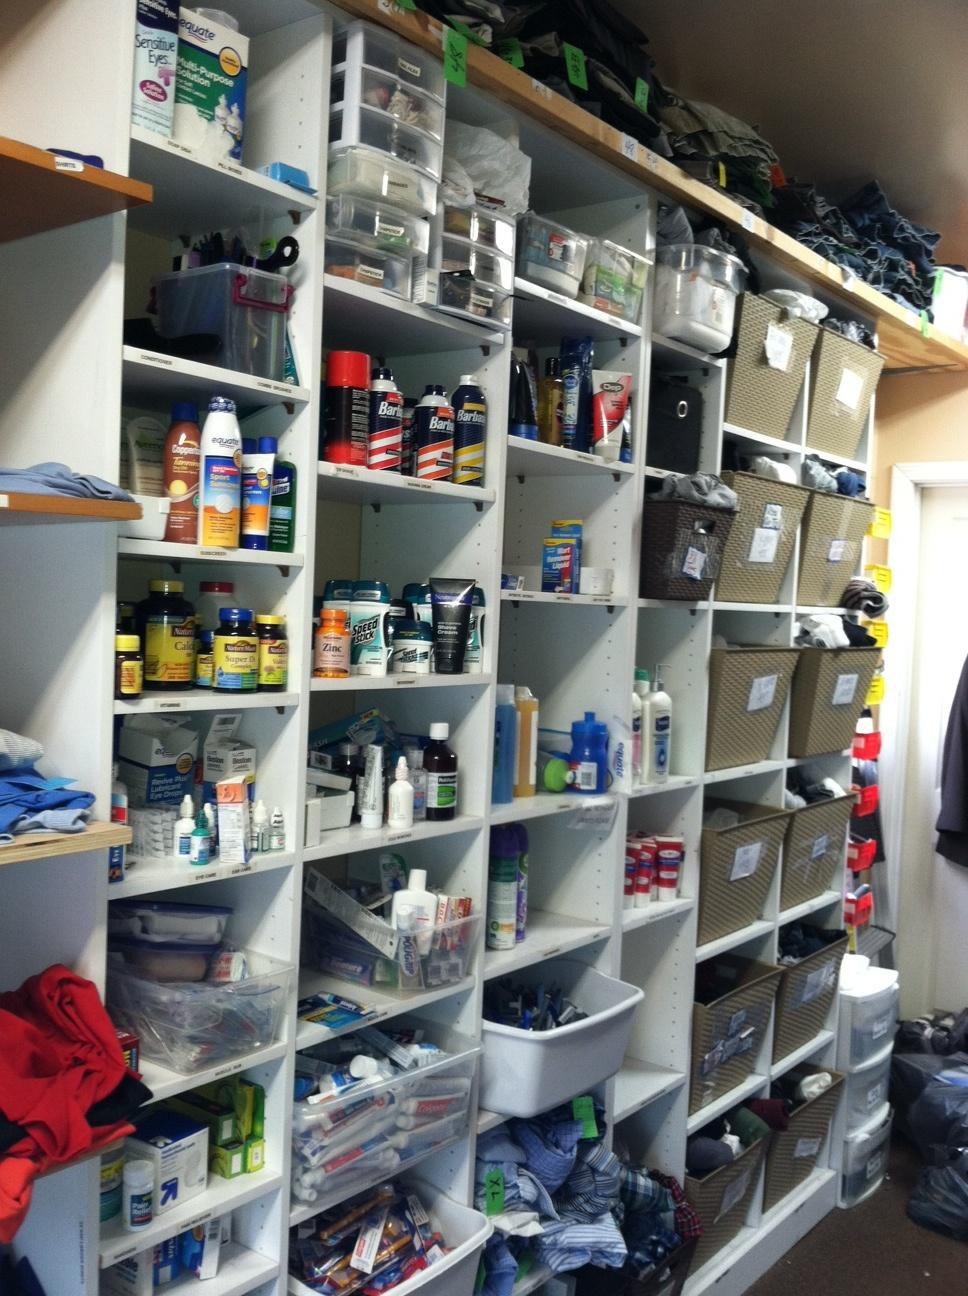 All Hygiene Items Needed